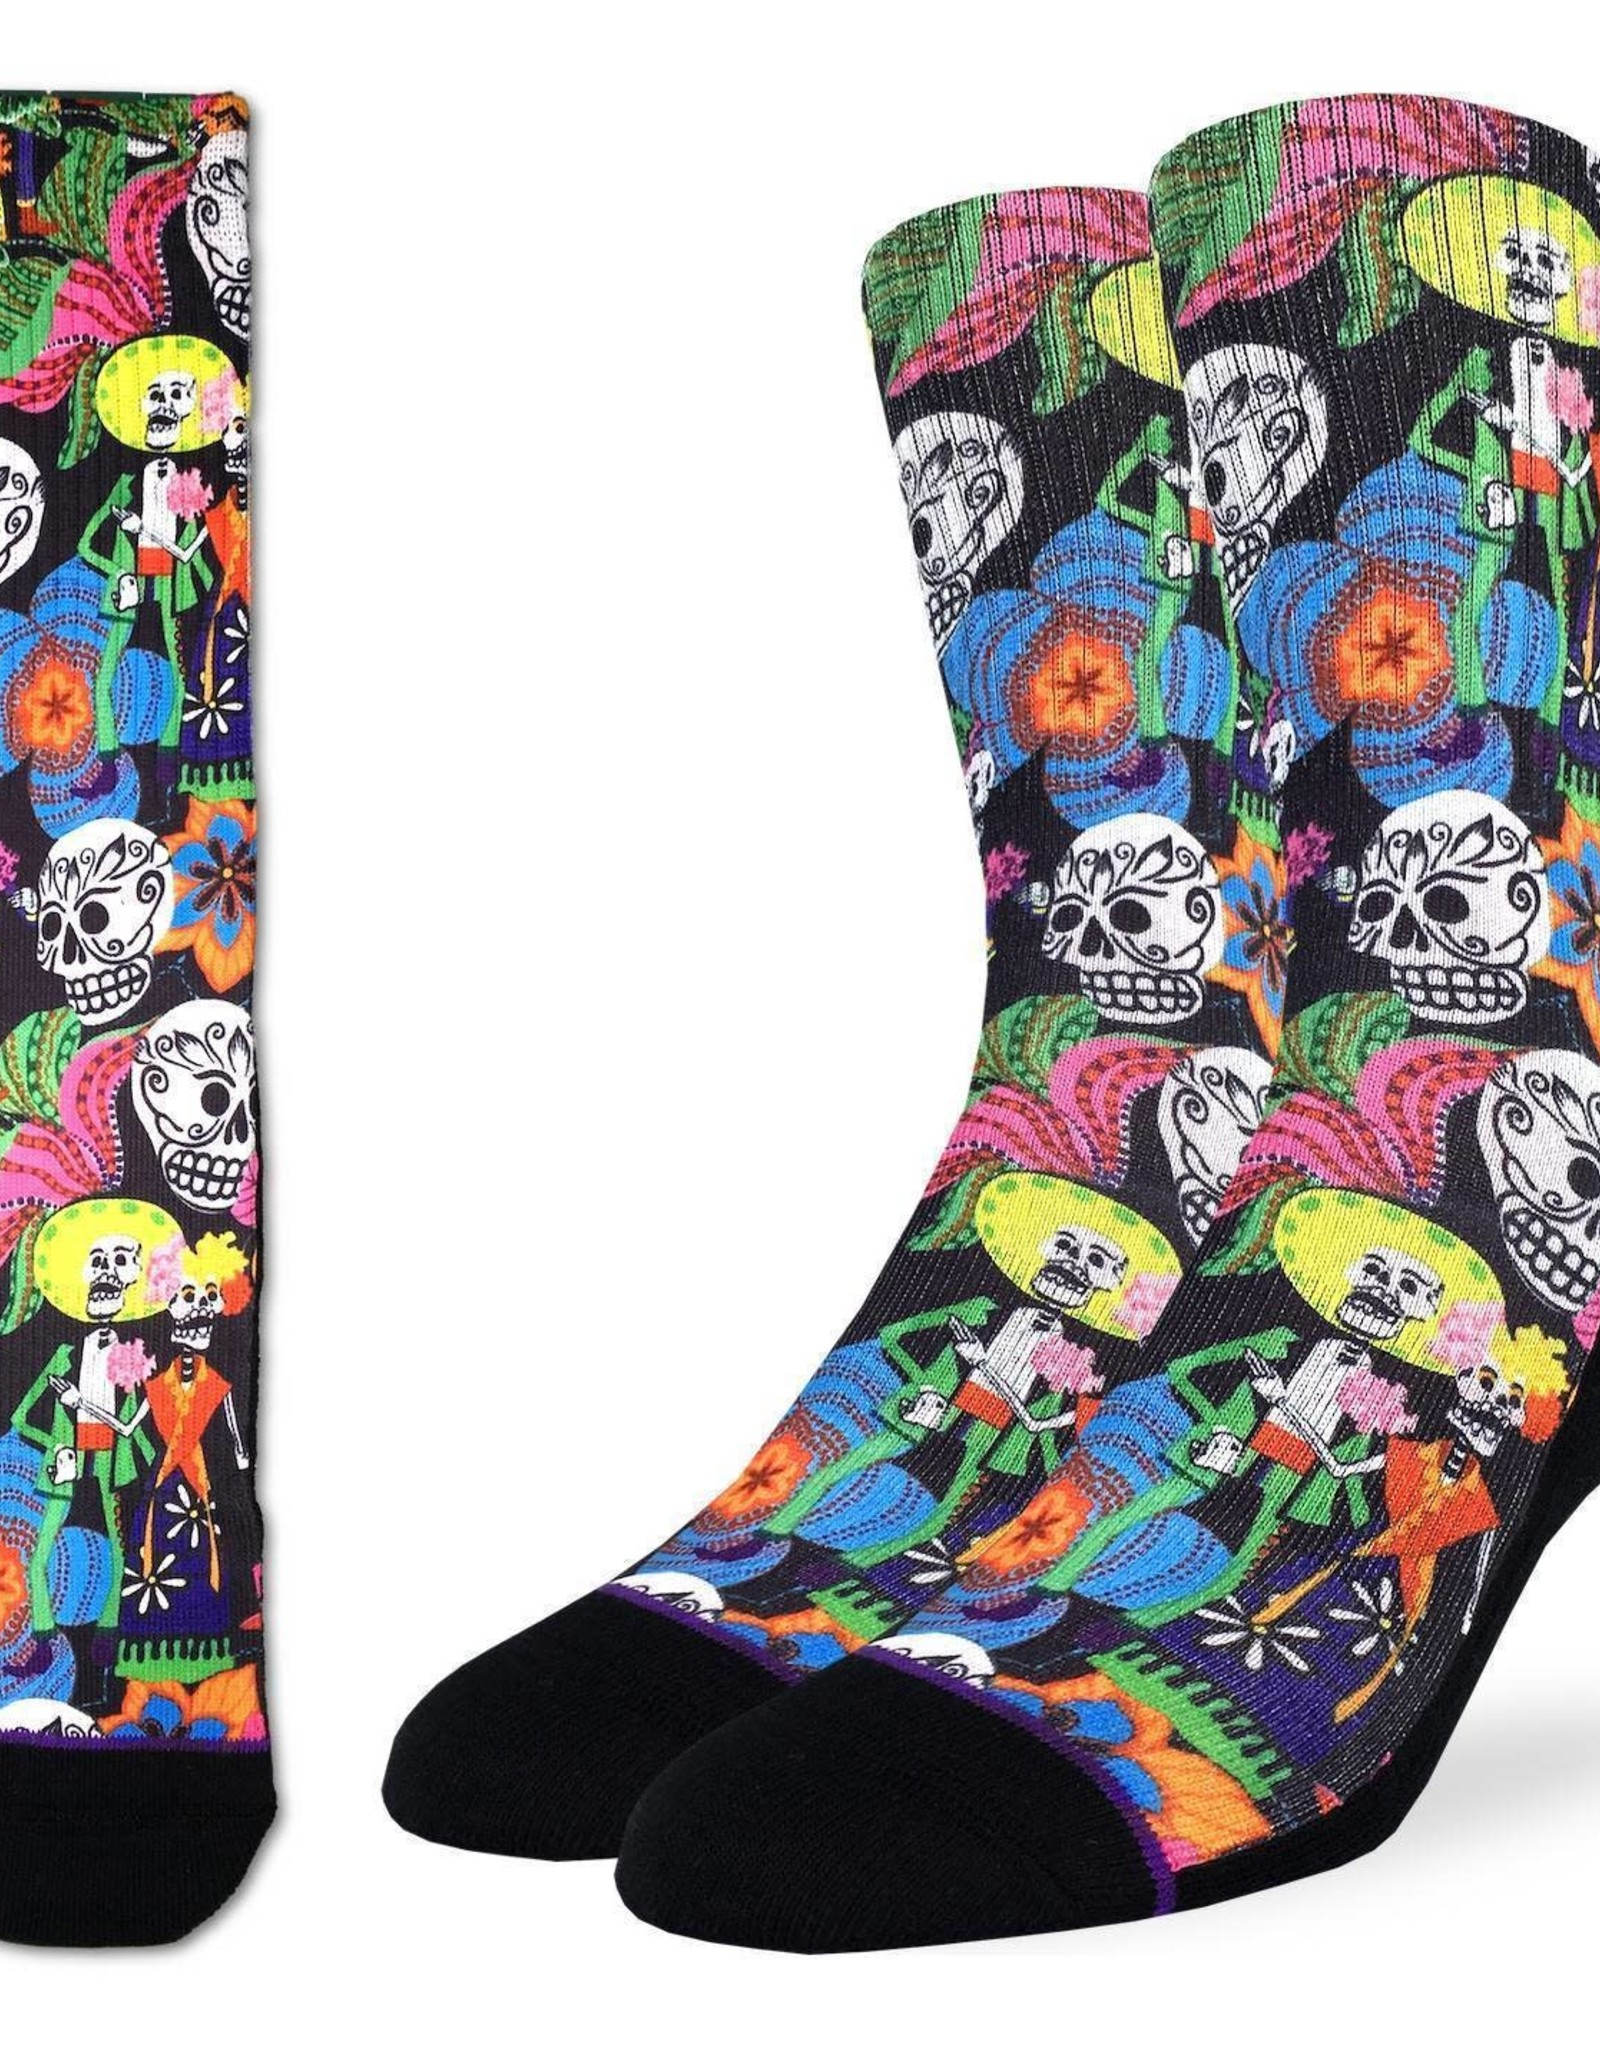 Skulls ( Bas Good Luck Sock )